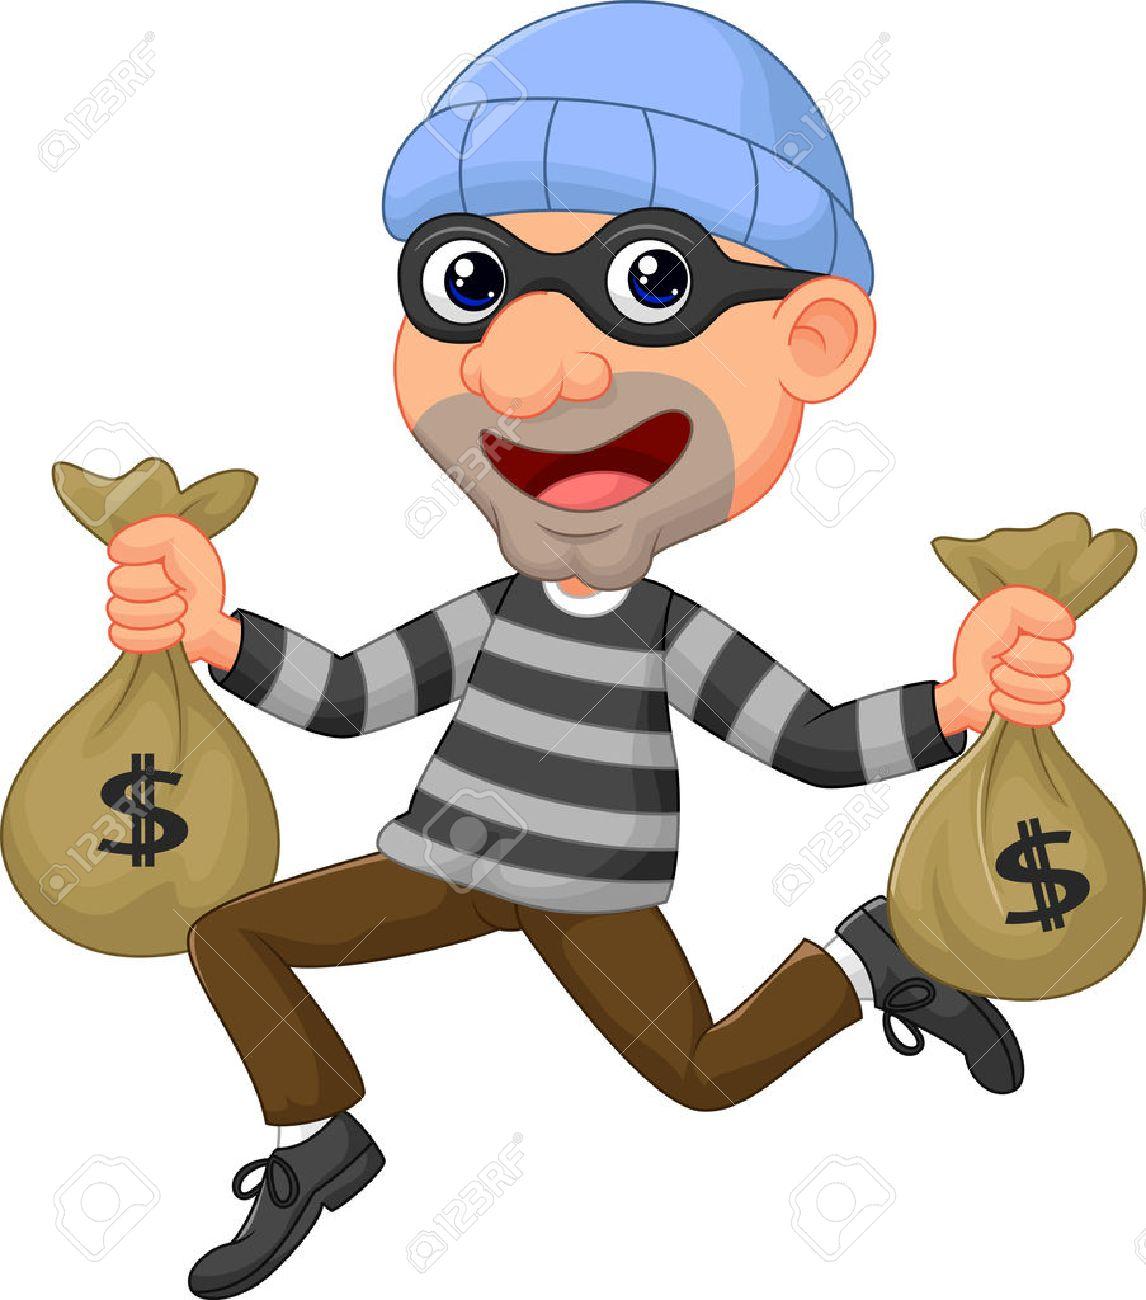 Cartoon Thief Running Thief Cartoon Carrying Bag of